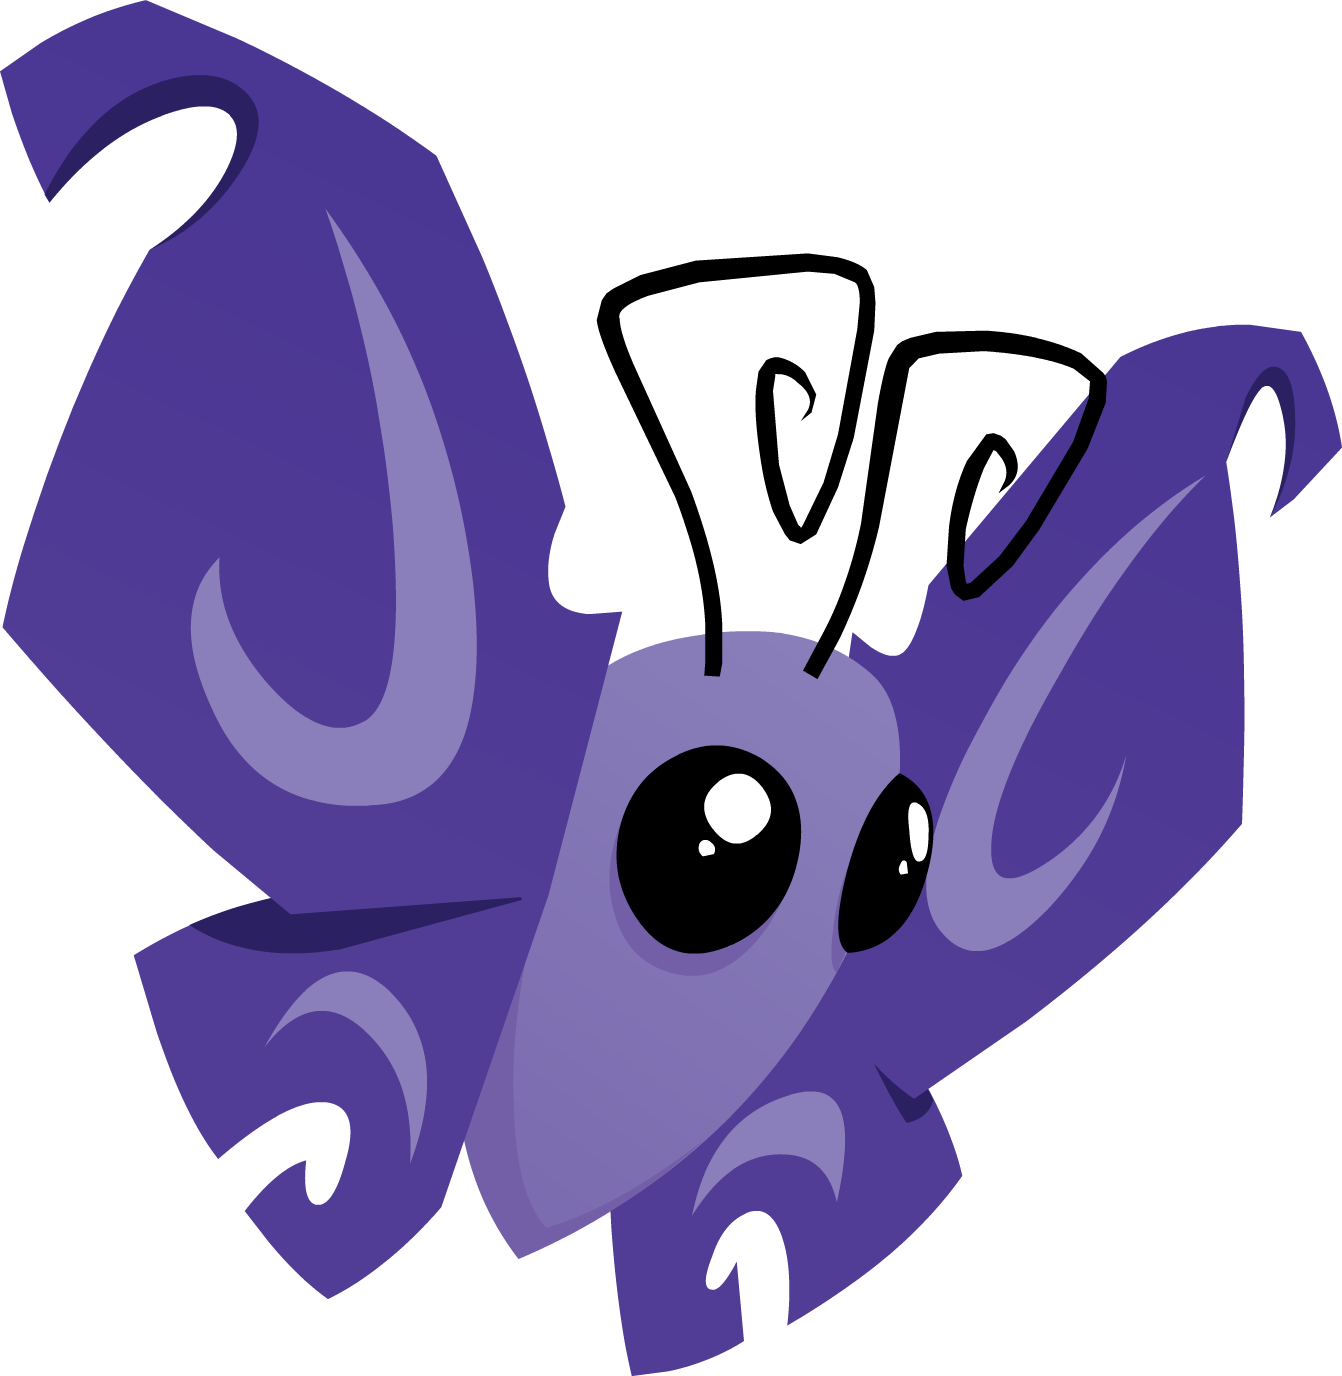 Jam clipart purple. Image pet butterfly png